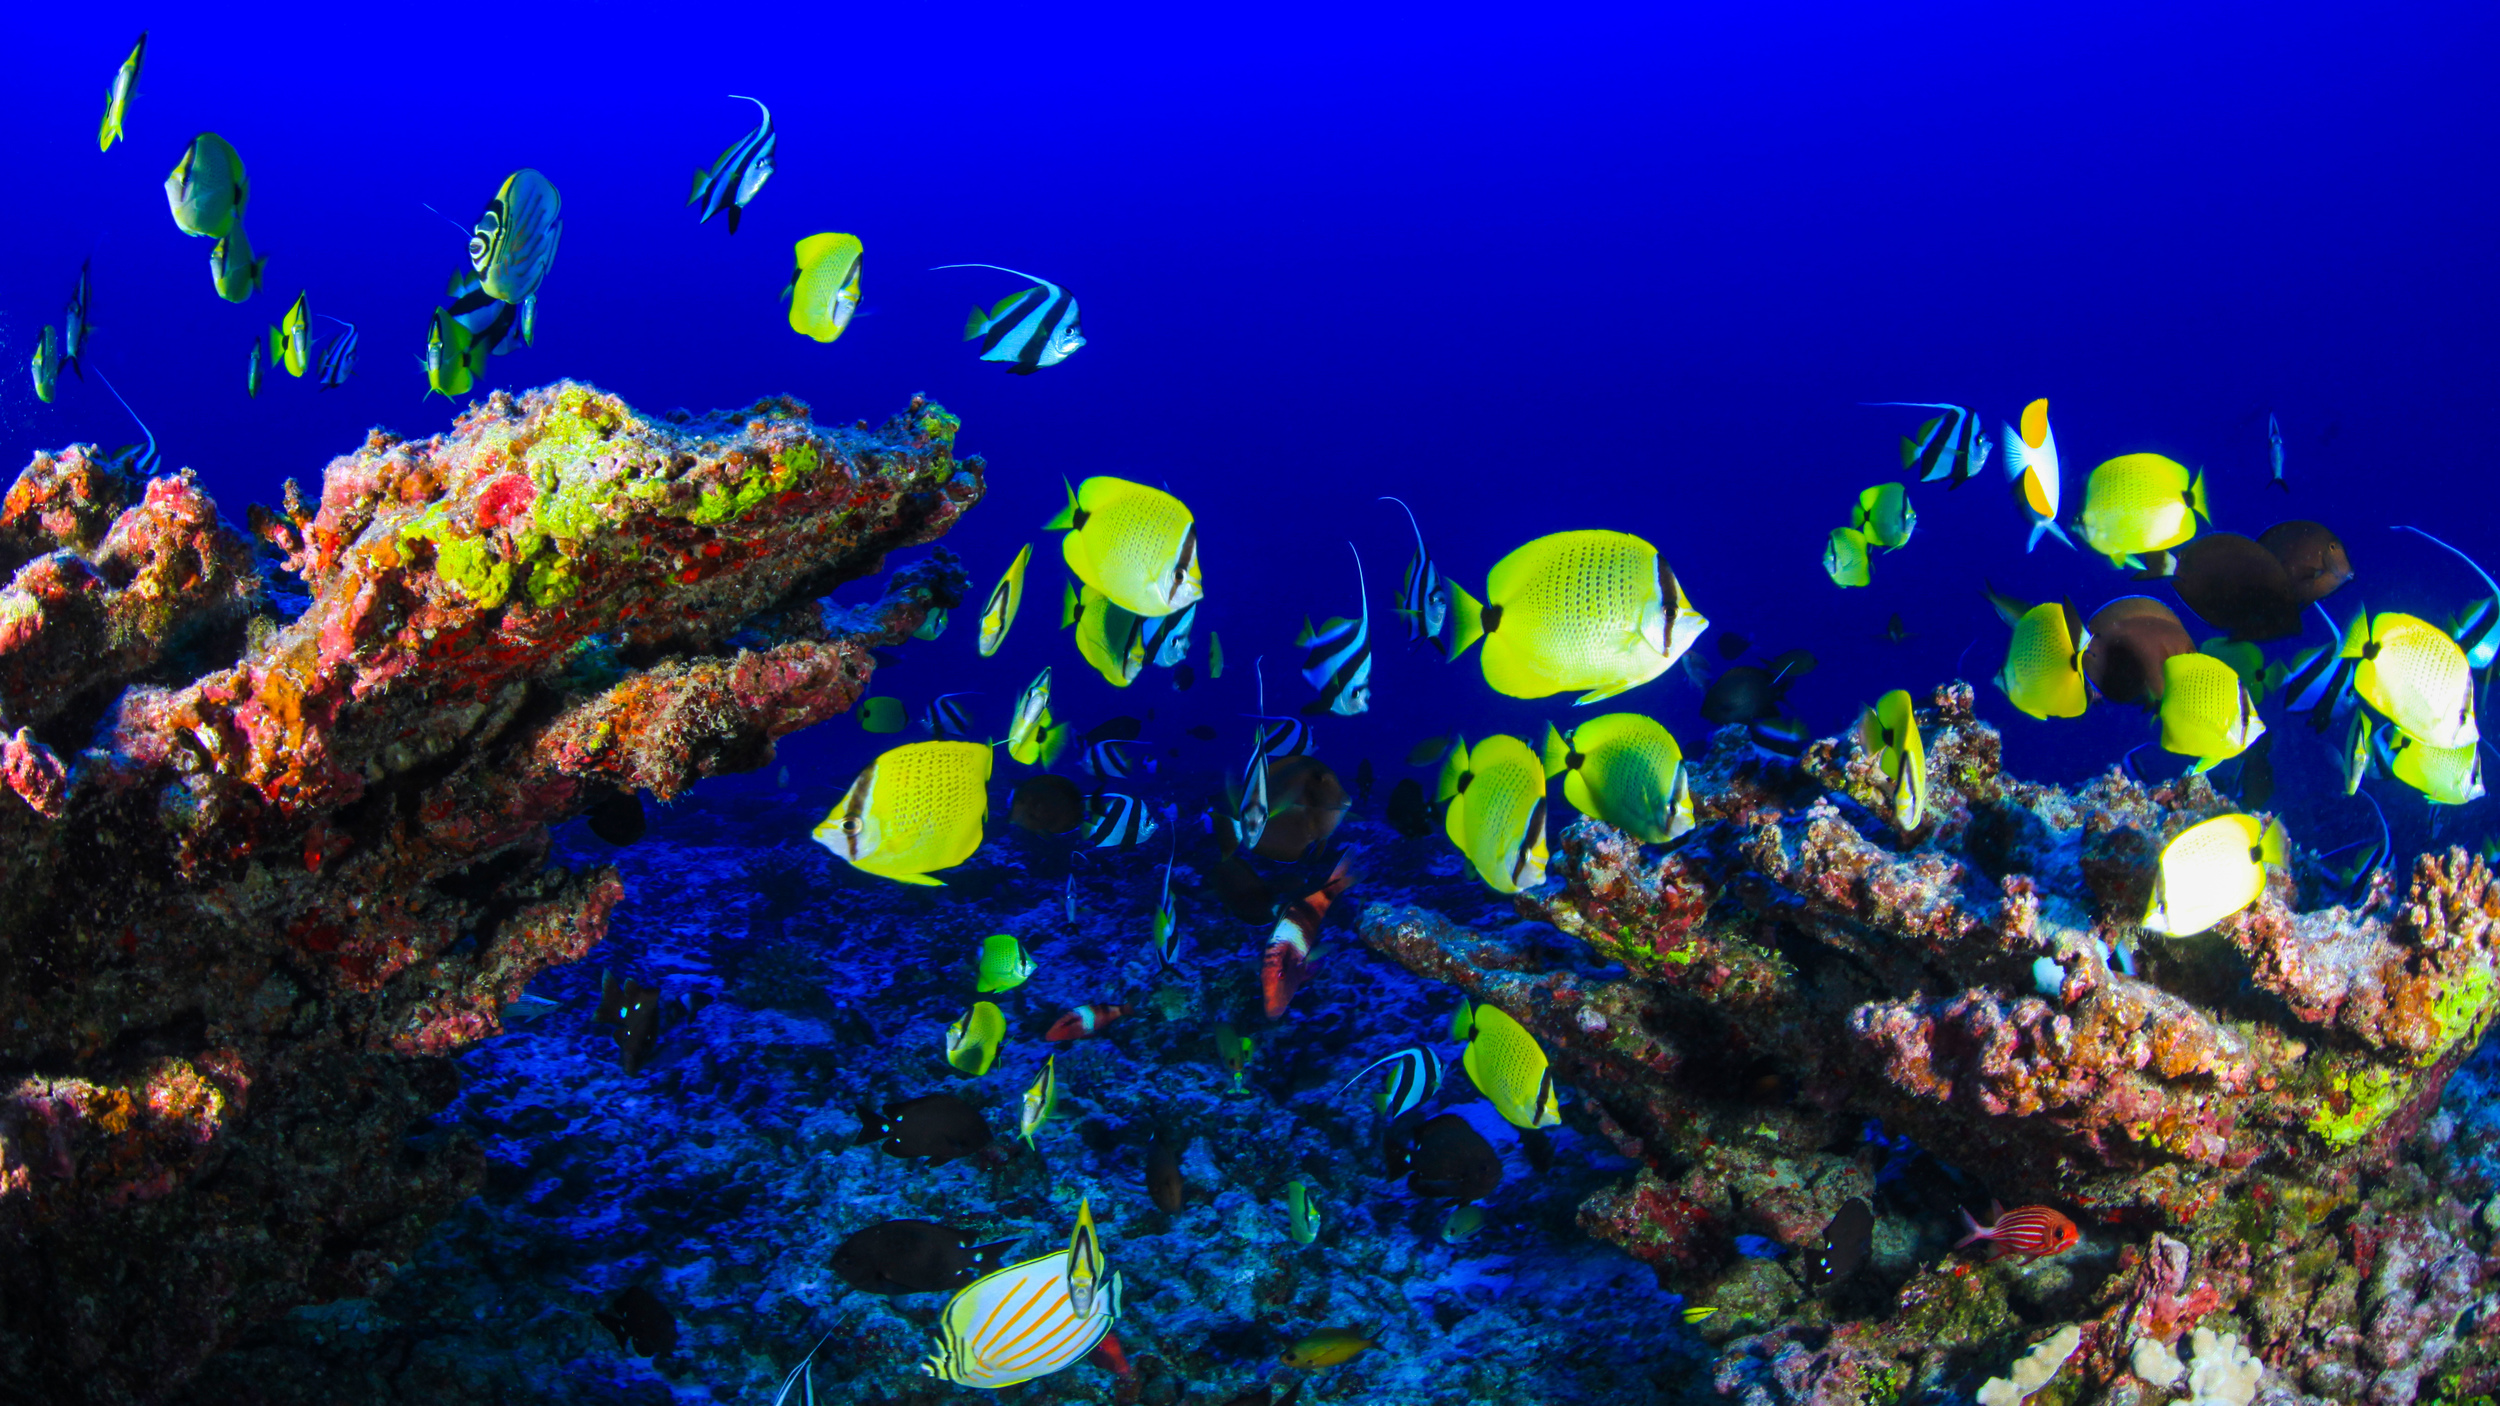 Coral, Reef, Underwater, Fish, The Wayward Post